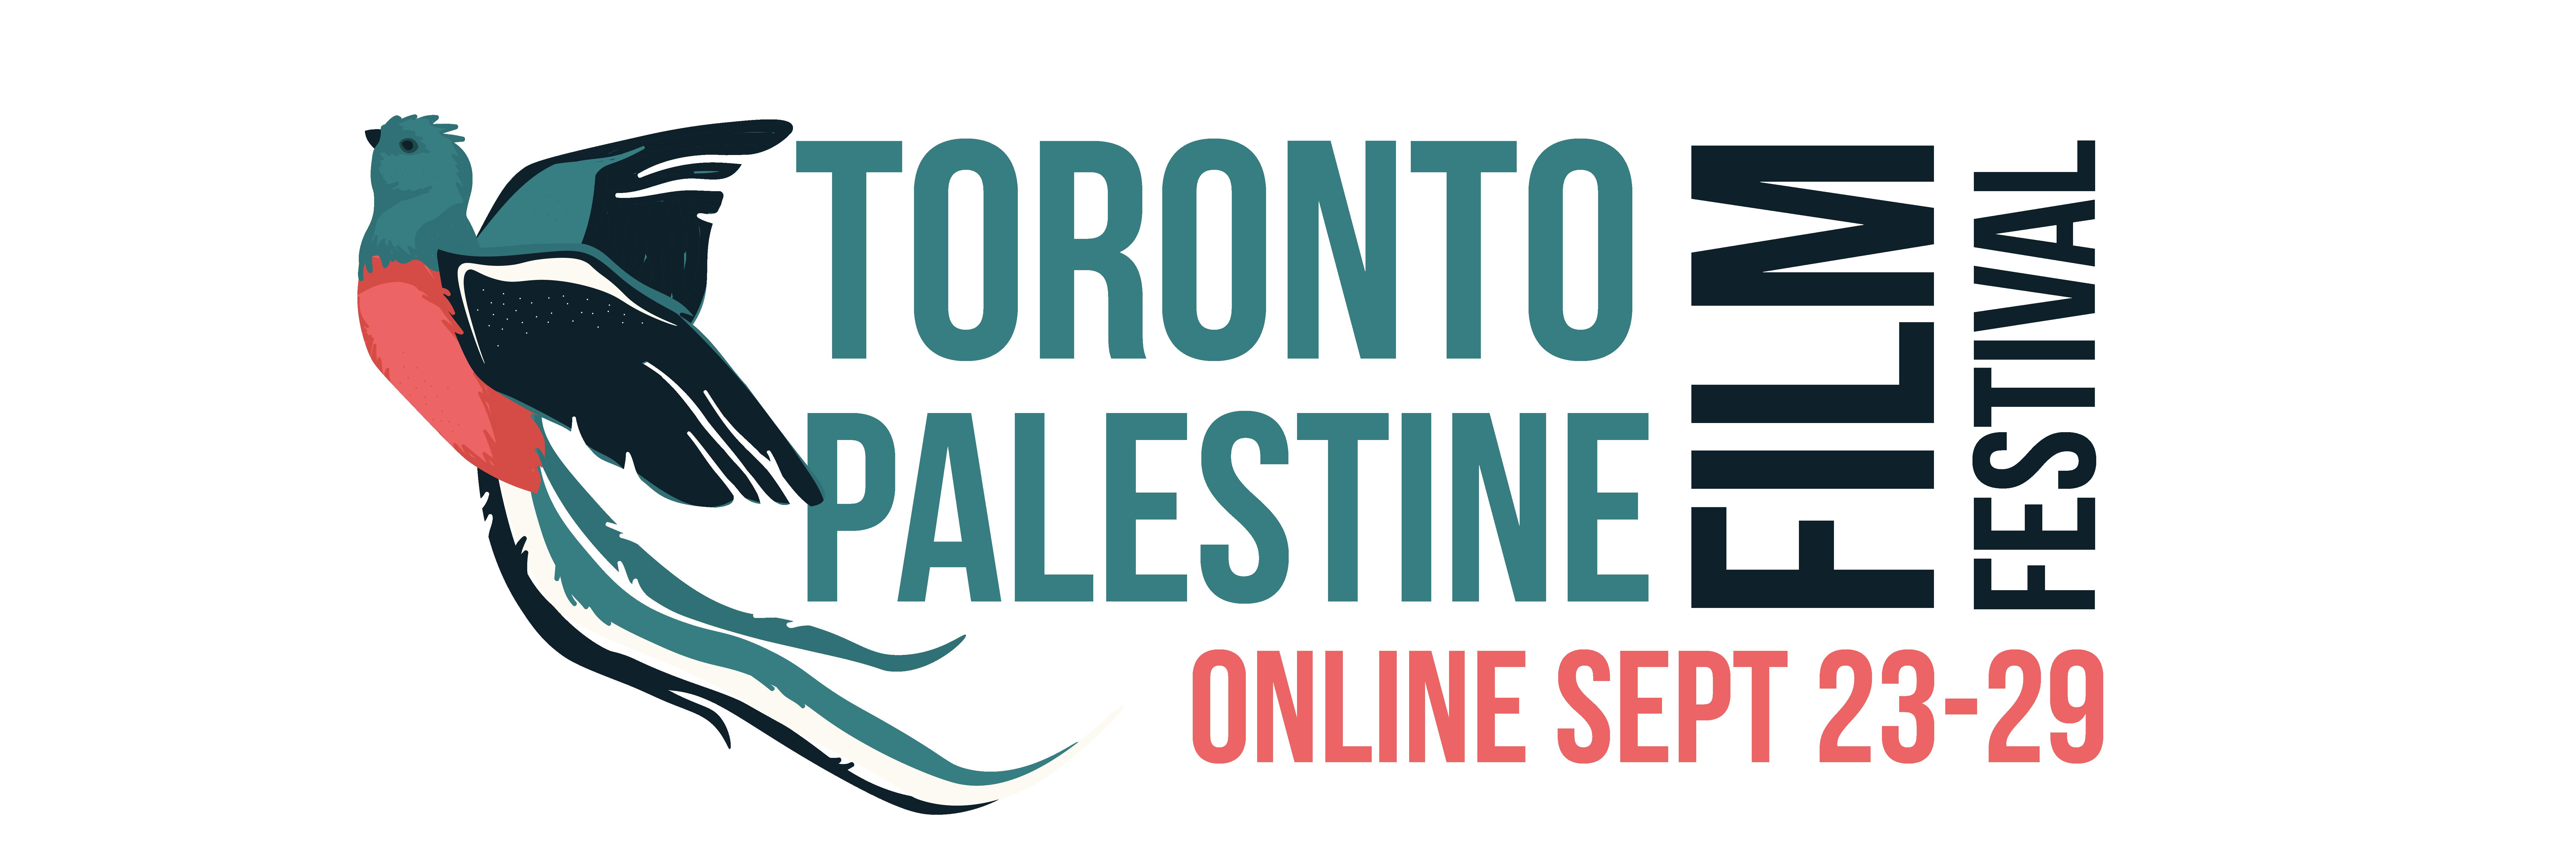 Toronto Palestine Film Festival